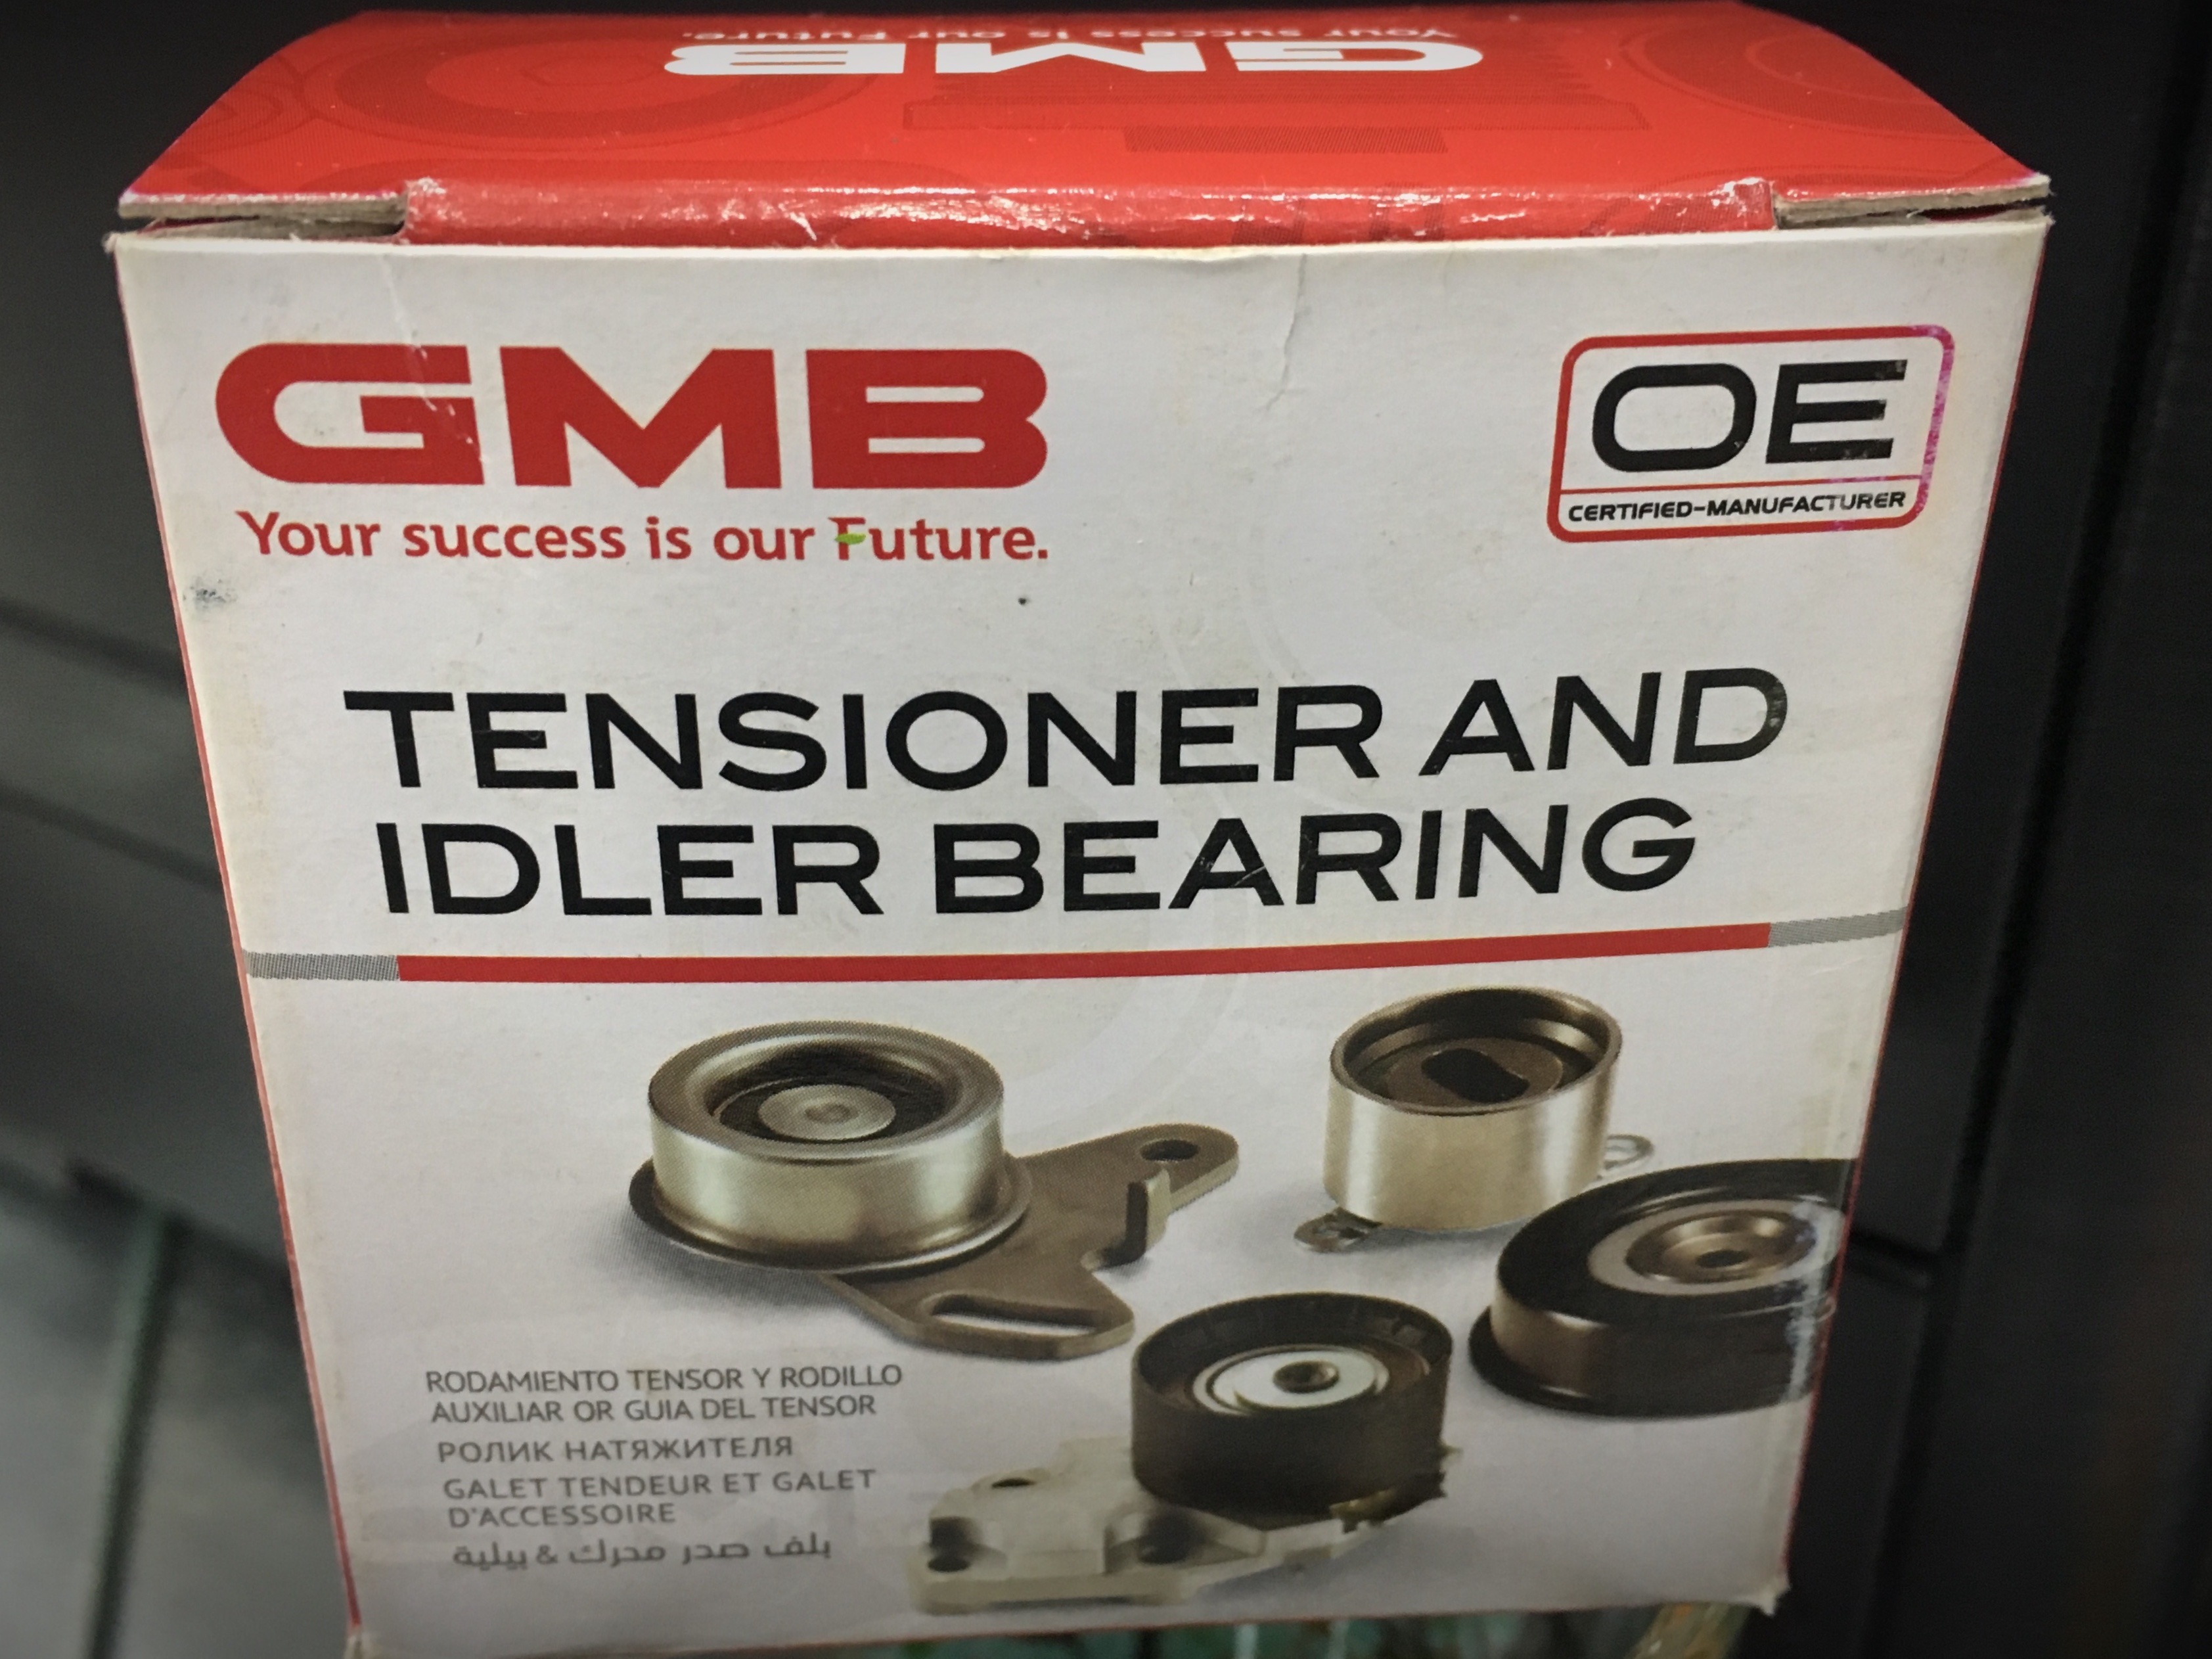 GT10130 GMB 2335742010, STAREX TENSIONER /22's_2